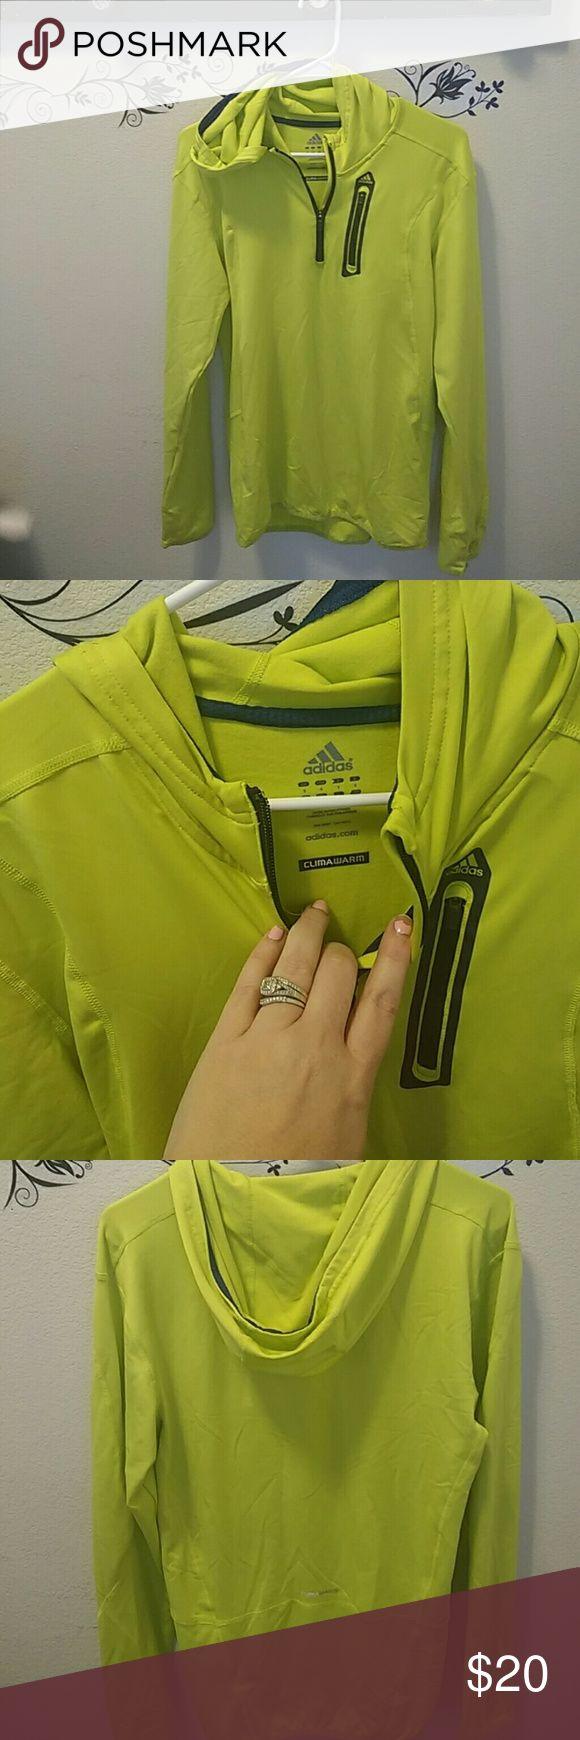 Adidas Women's Running Jacket Climawarm Adidas Jackets & Coats